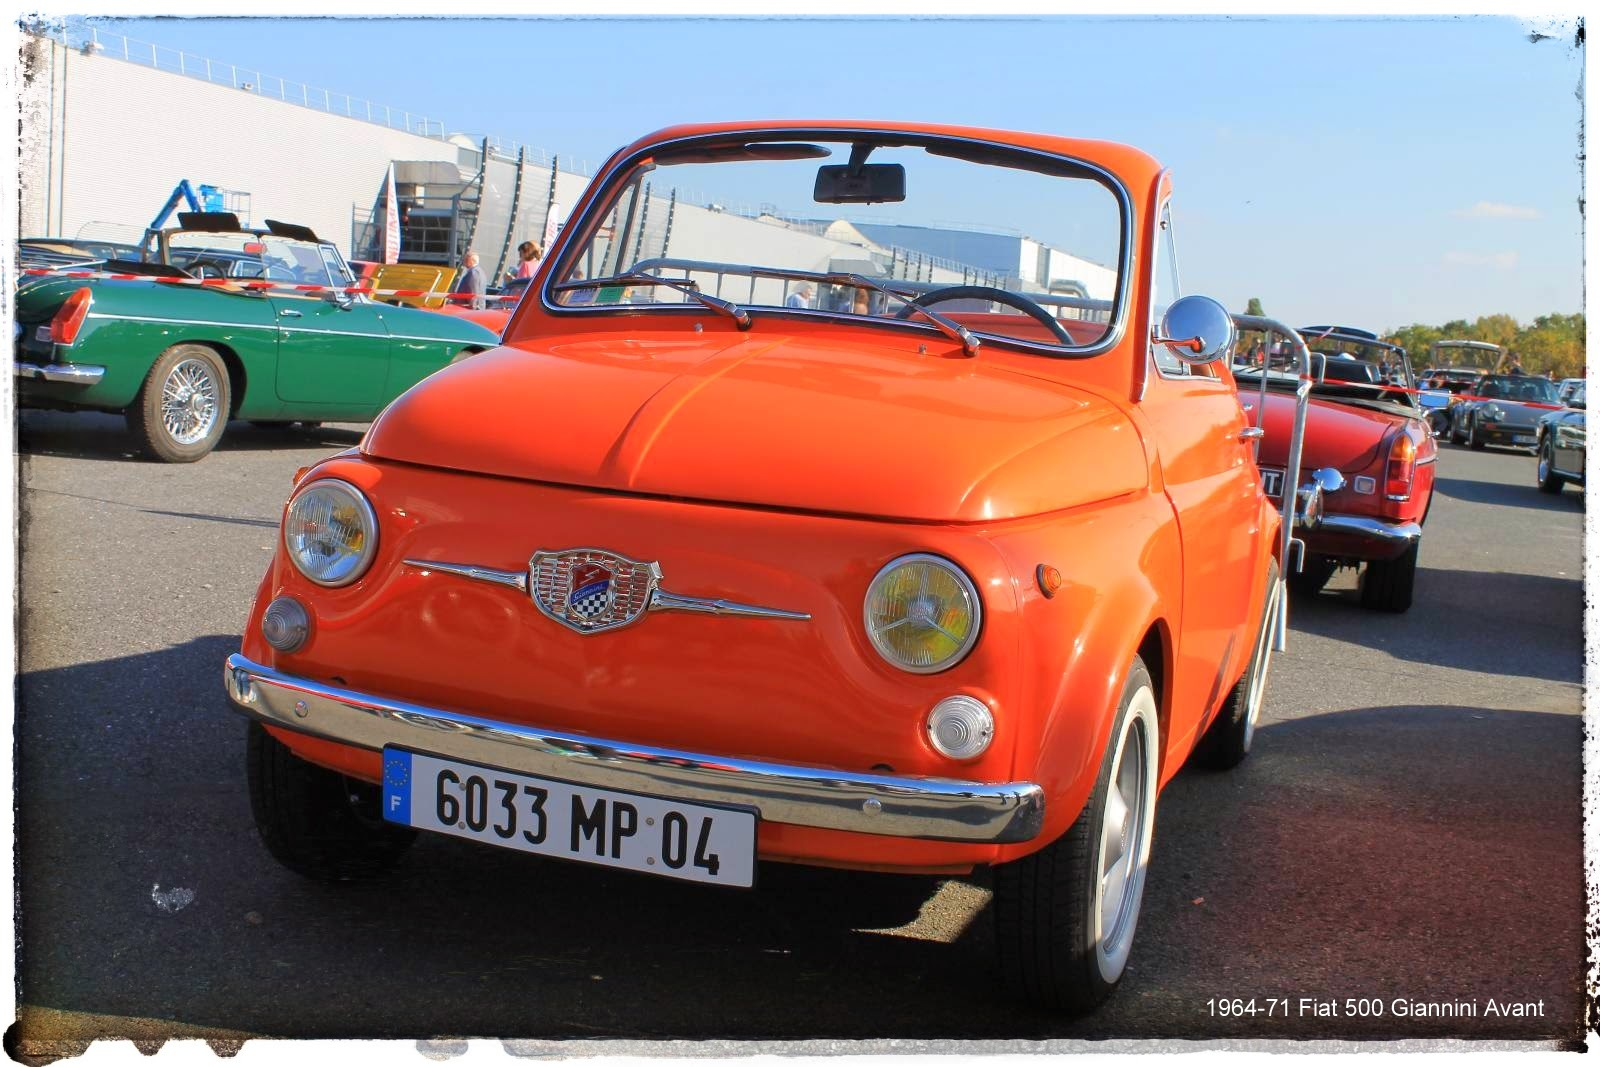 Automédon - 1964-71 Fiat 500 Giannini Avant